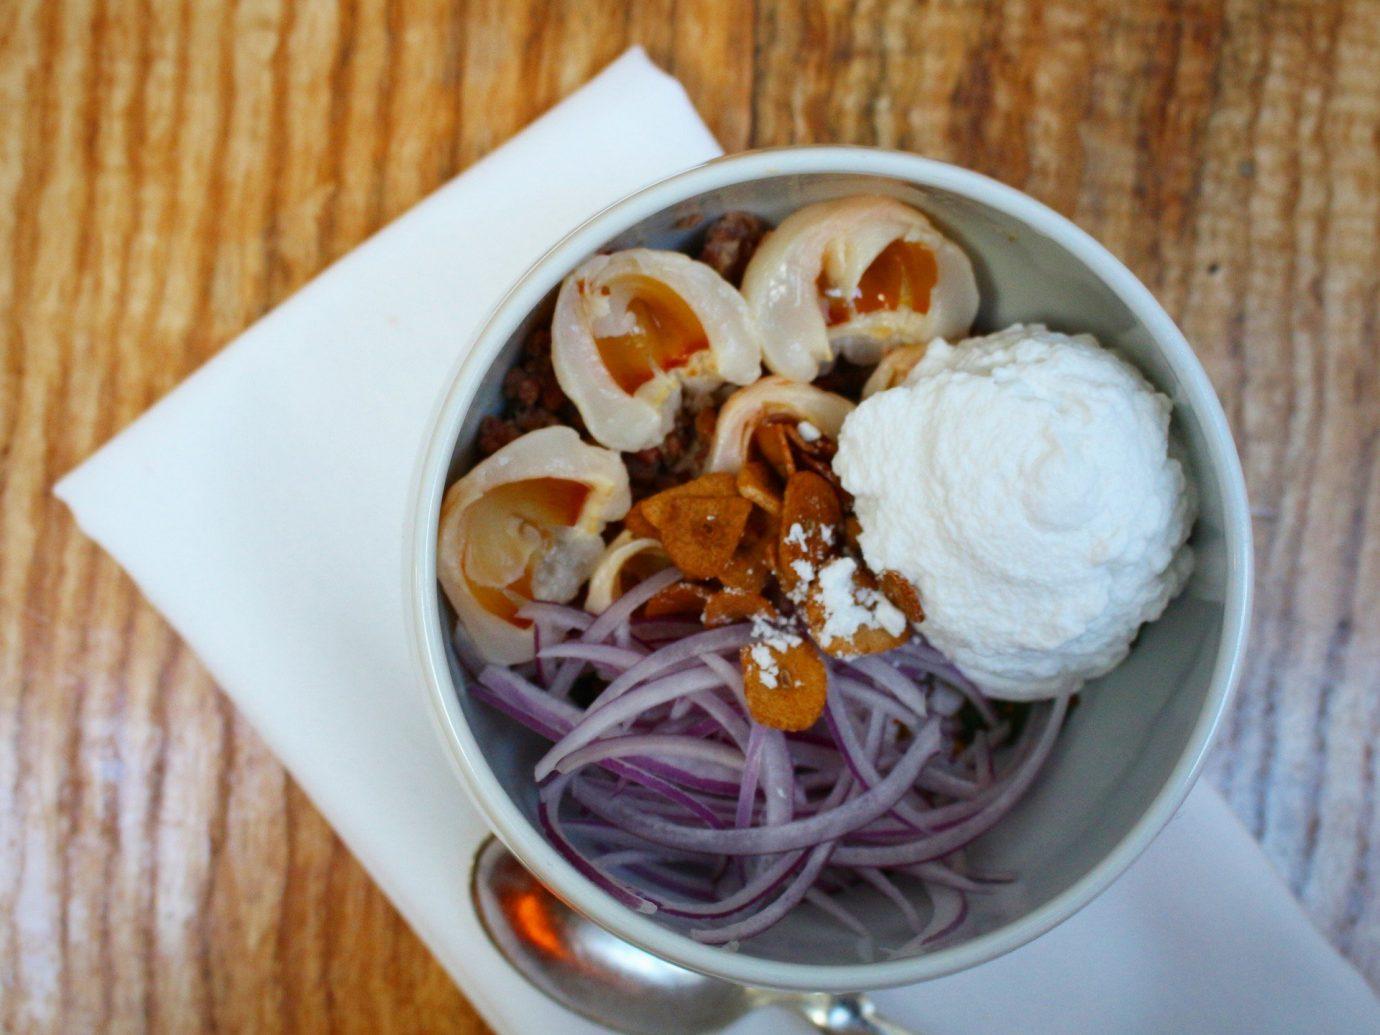 Food + Drink food table plate dish cuisine meal produce breakfast asian food spaghetti flavor